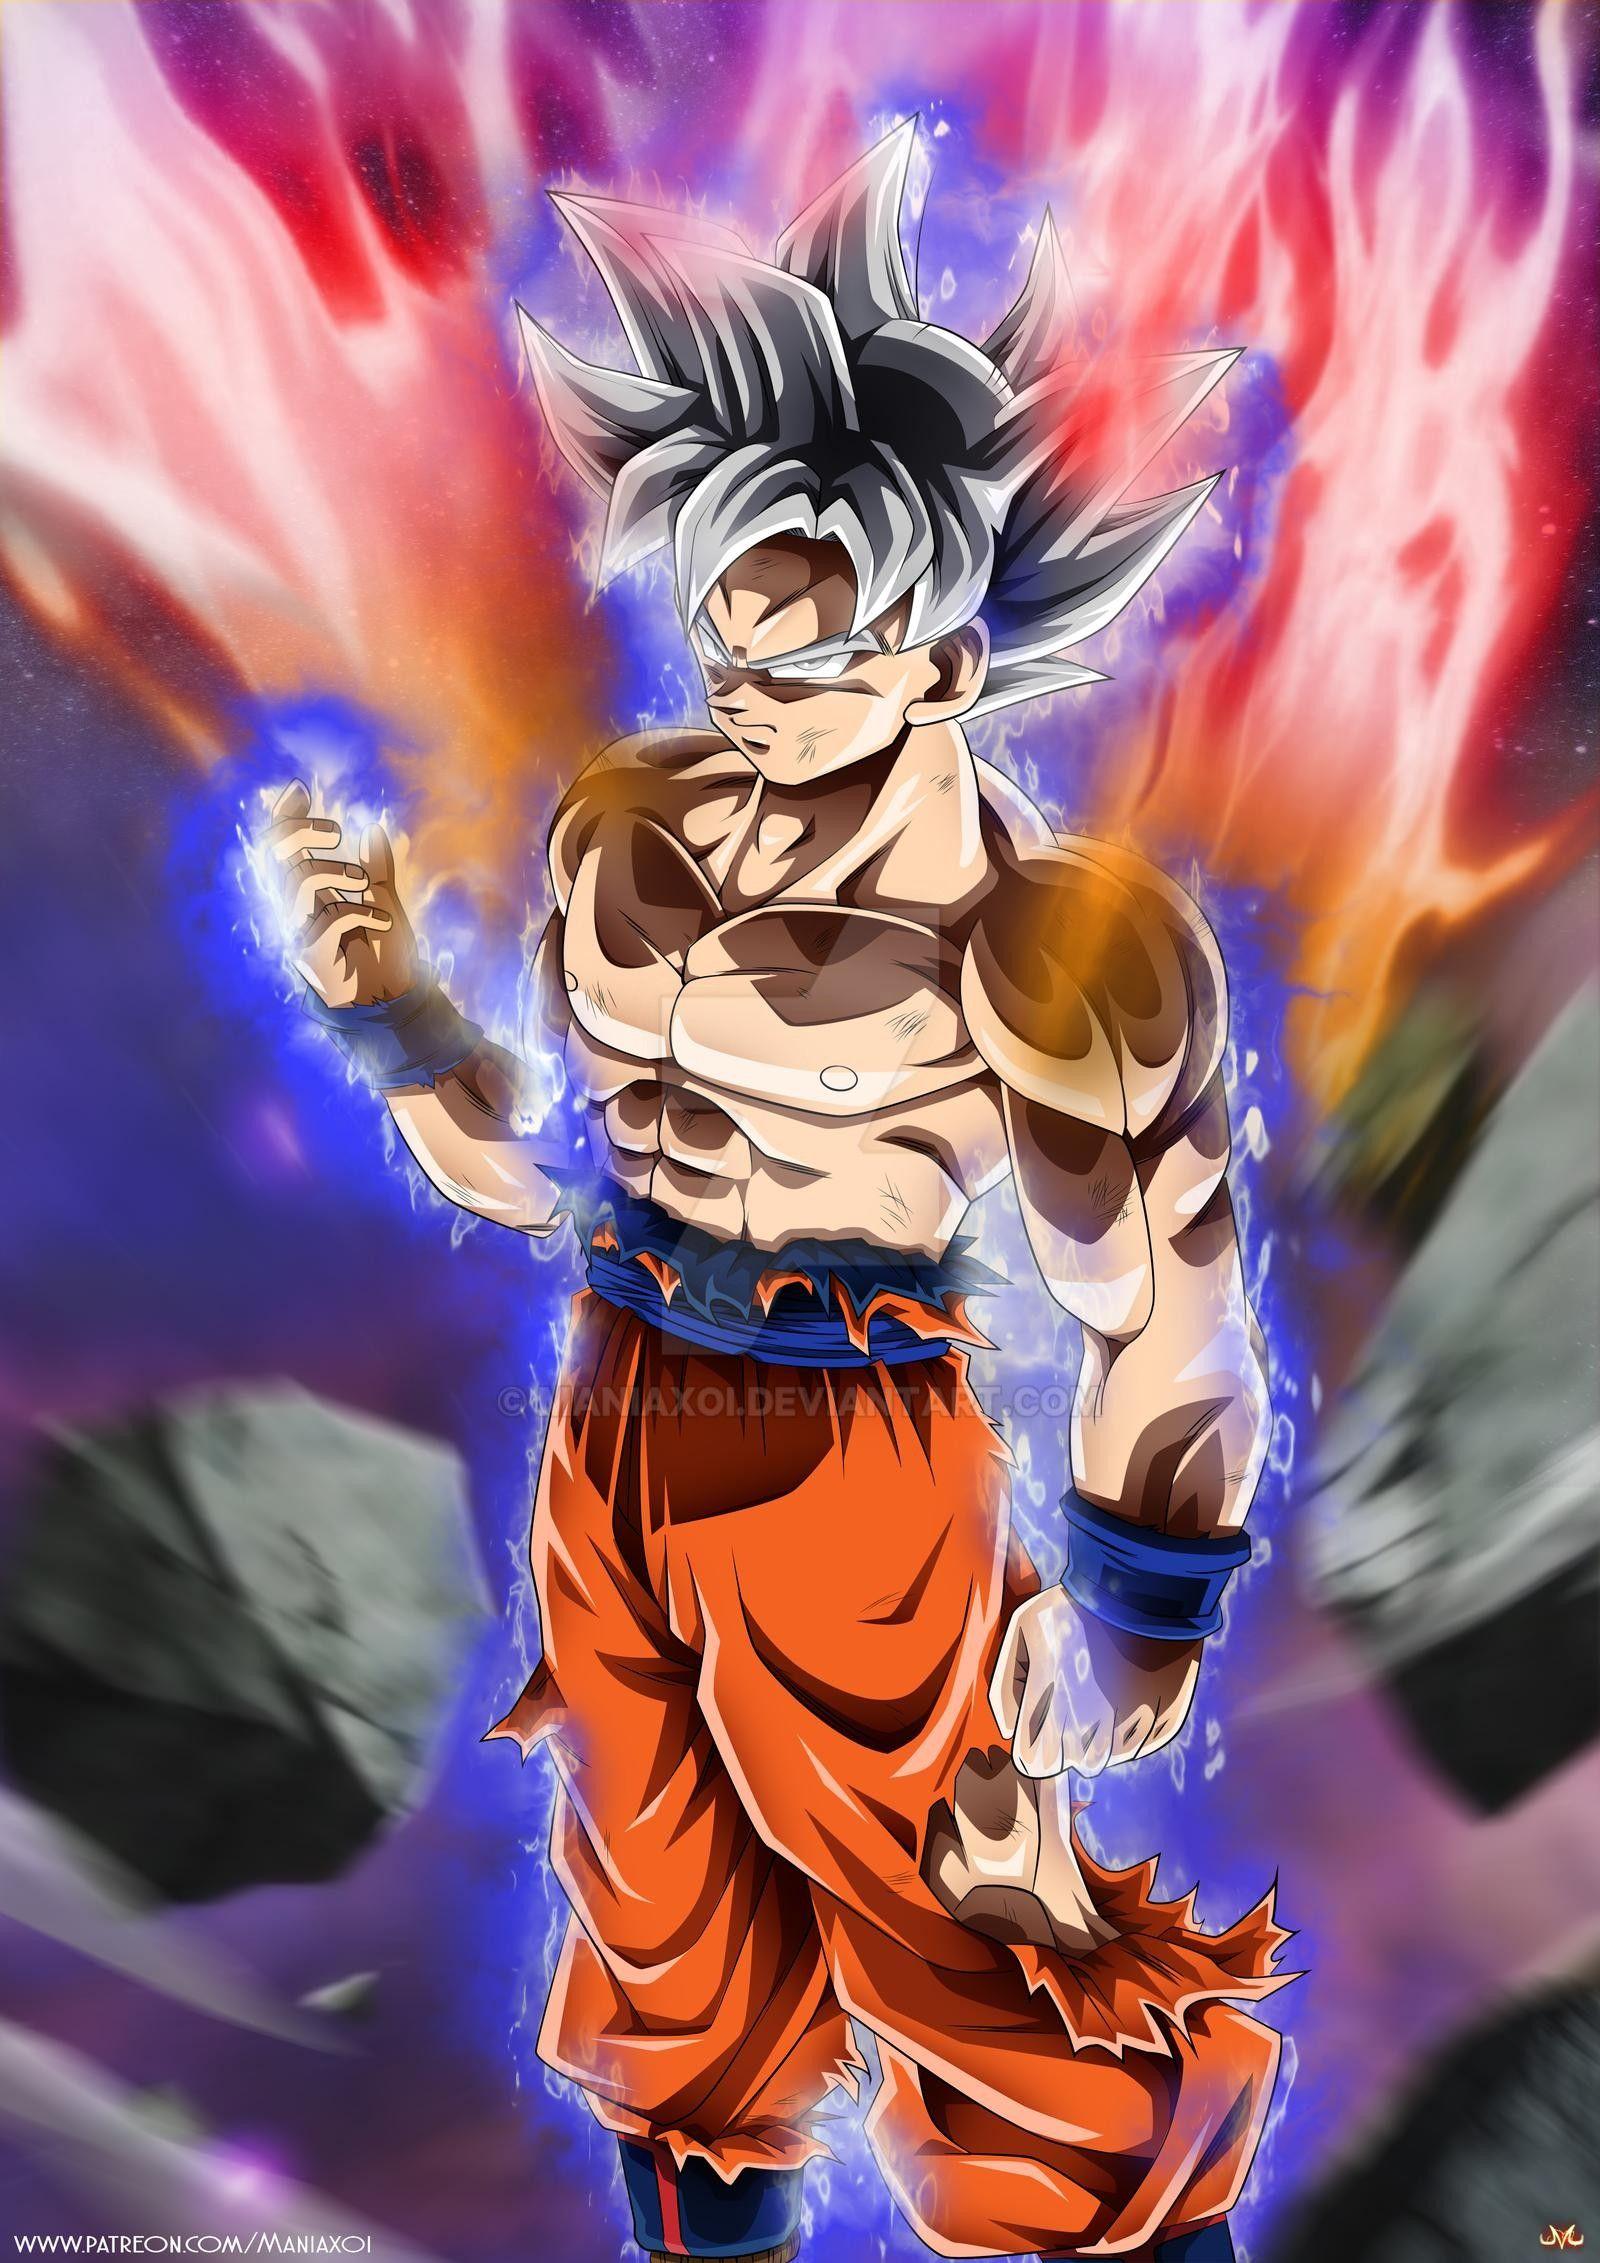 Goku Mastered Ultra Instinct By Maniaxoi On Deviantart Anime Dragon Ball Super Dragon Ball Super Art Dragon Ball Super Goku